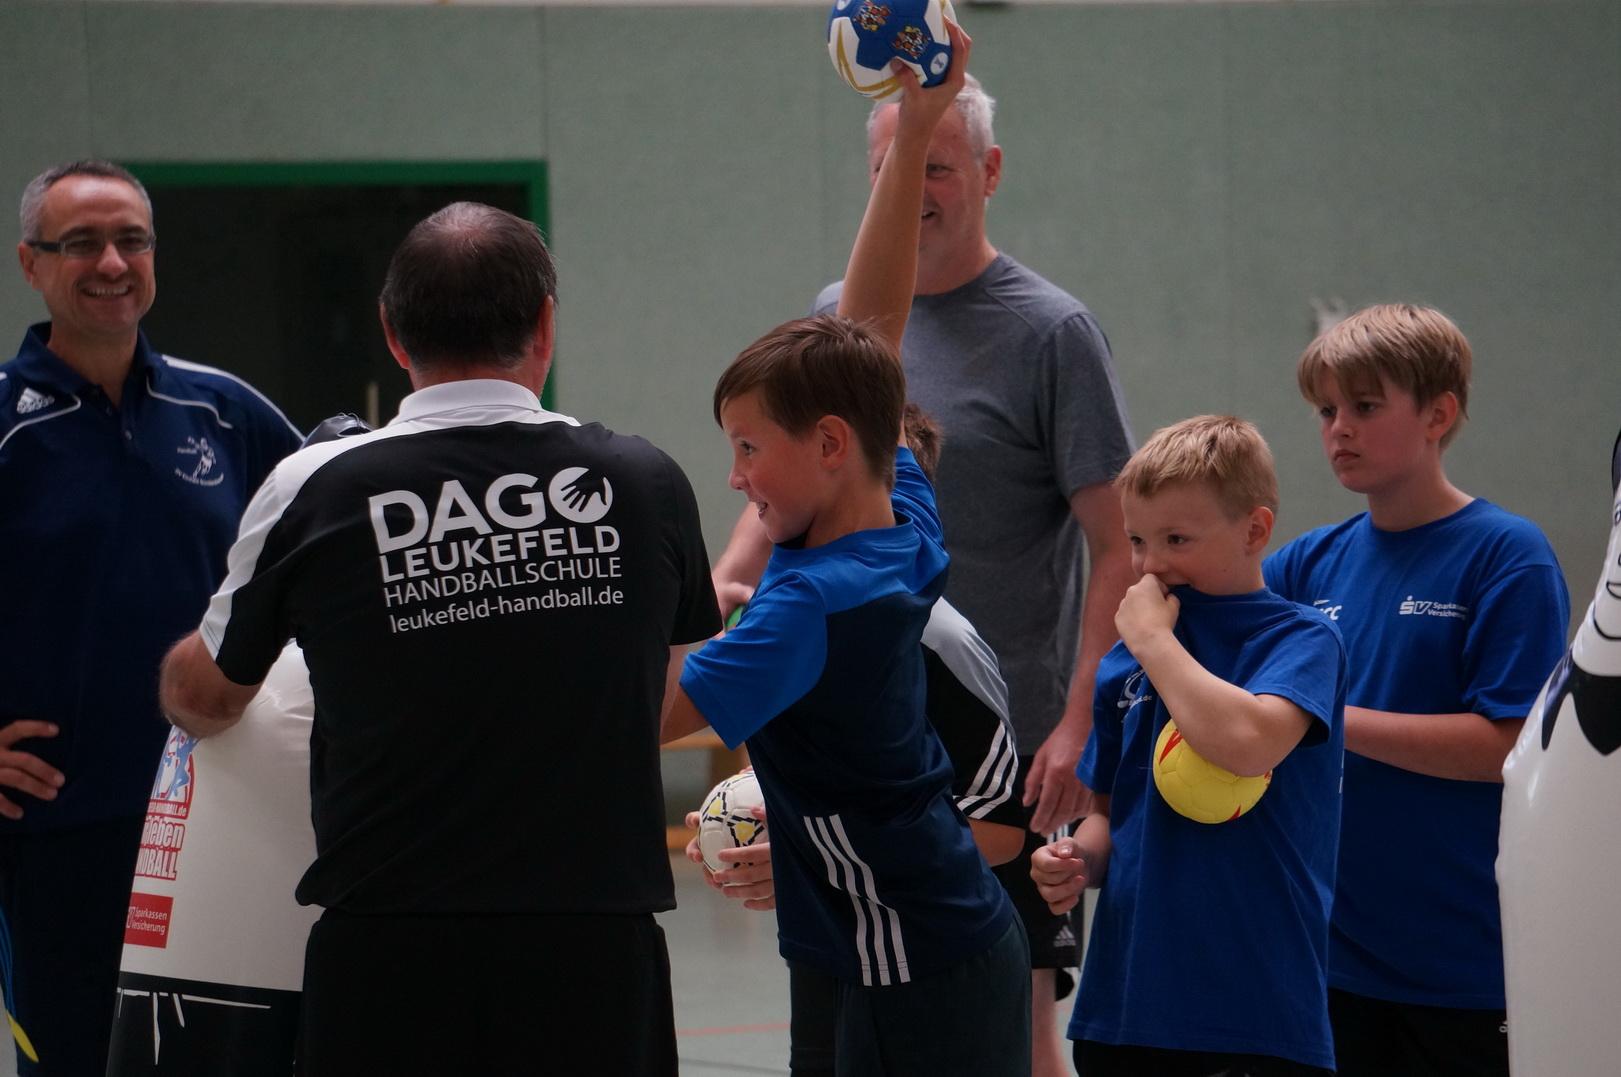 201808_Handballcamp_SDH_MG_225w